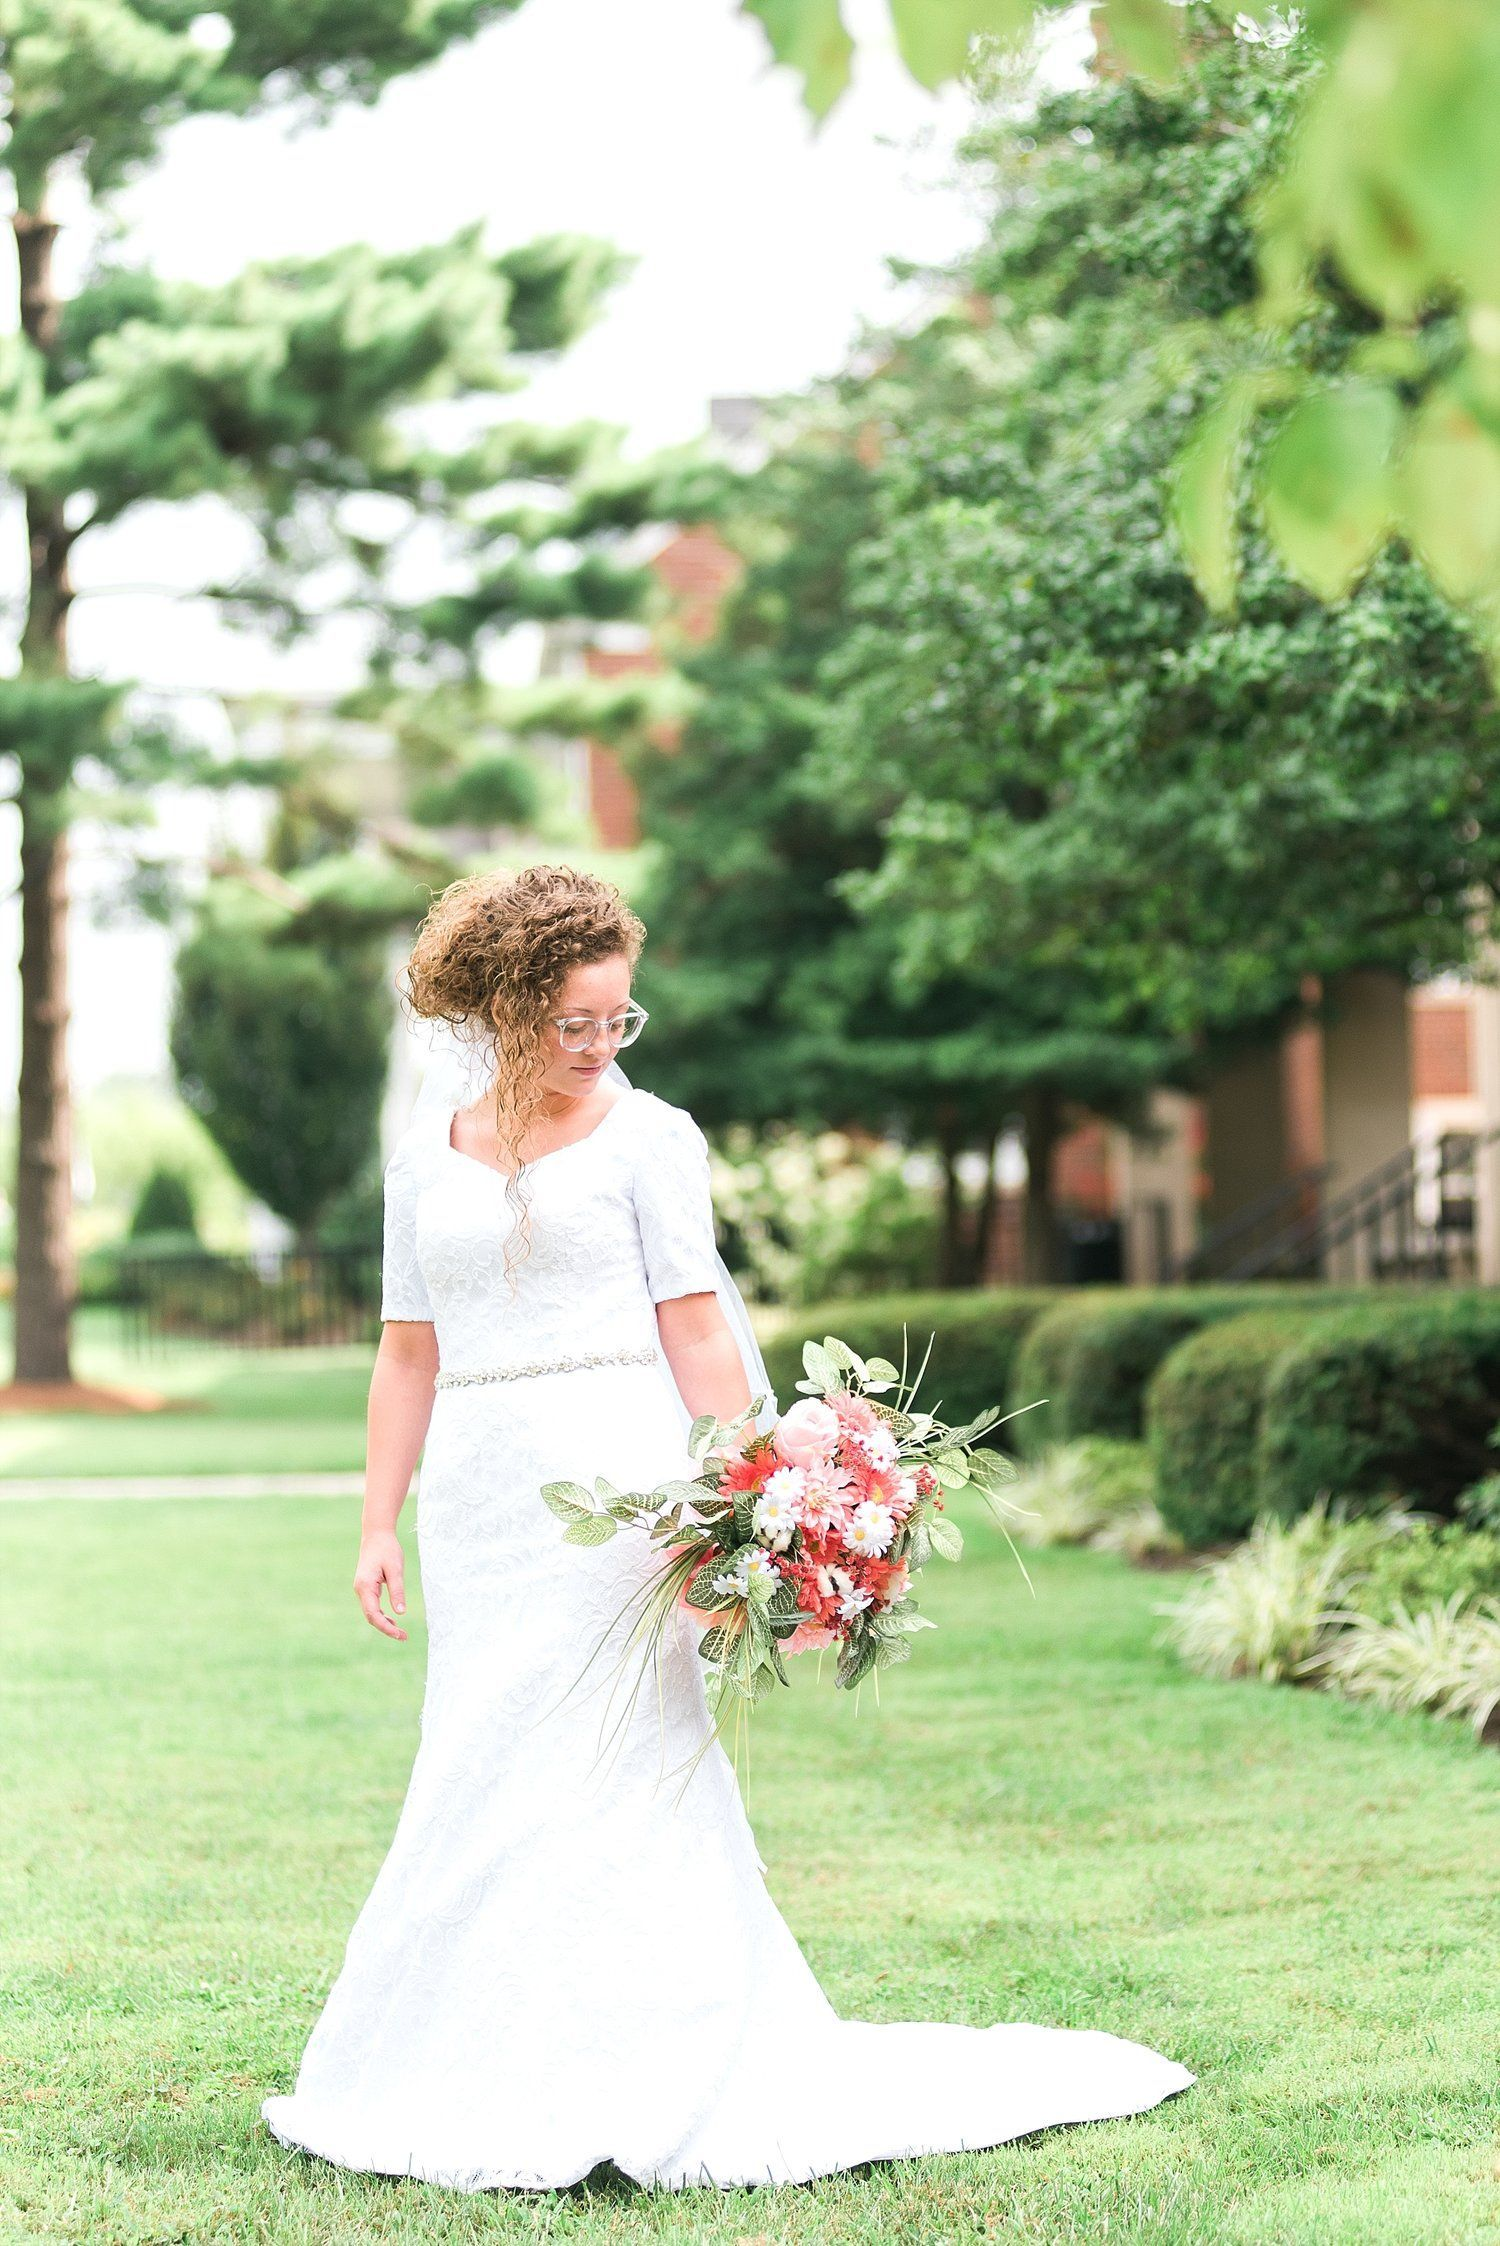 Lexington, KY wedding photographers, Keith & Melissa Photography